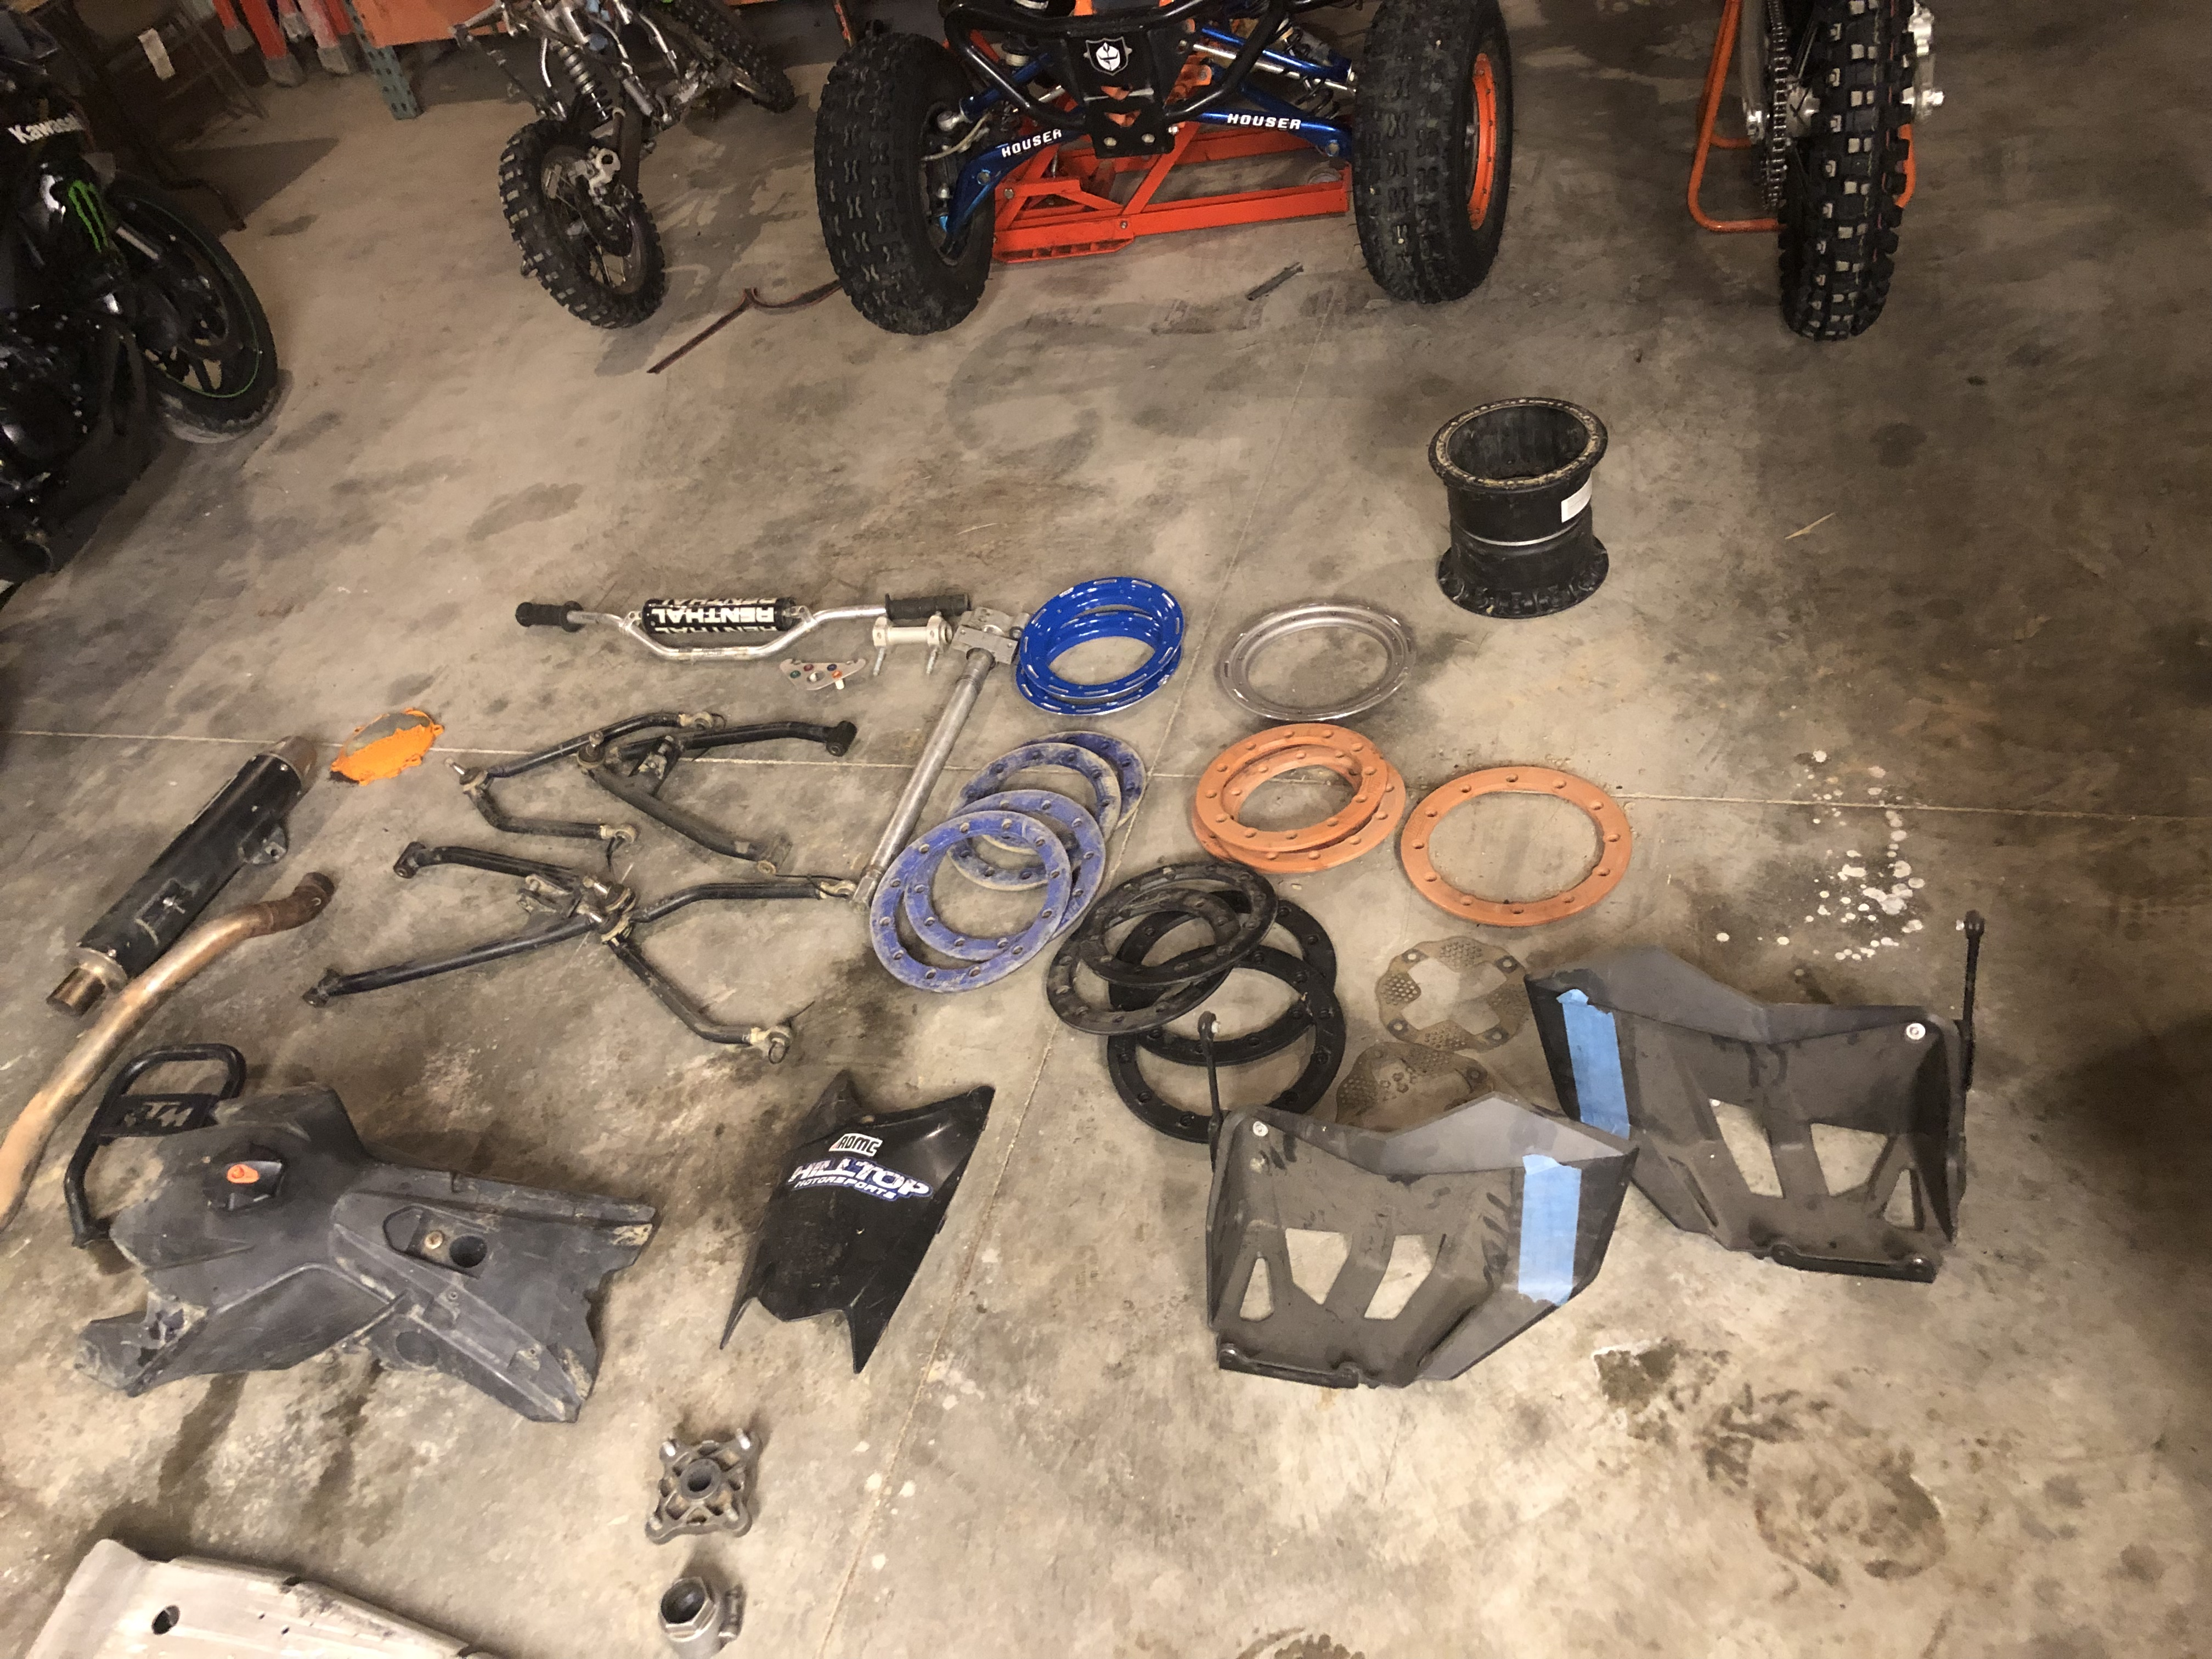 Parts for sale-99018f67-1fde-422c-98bf-84966117e616.jpeg